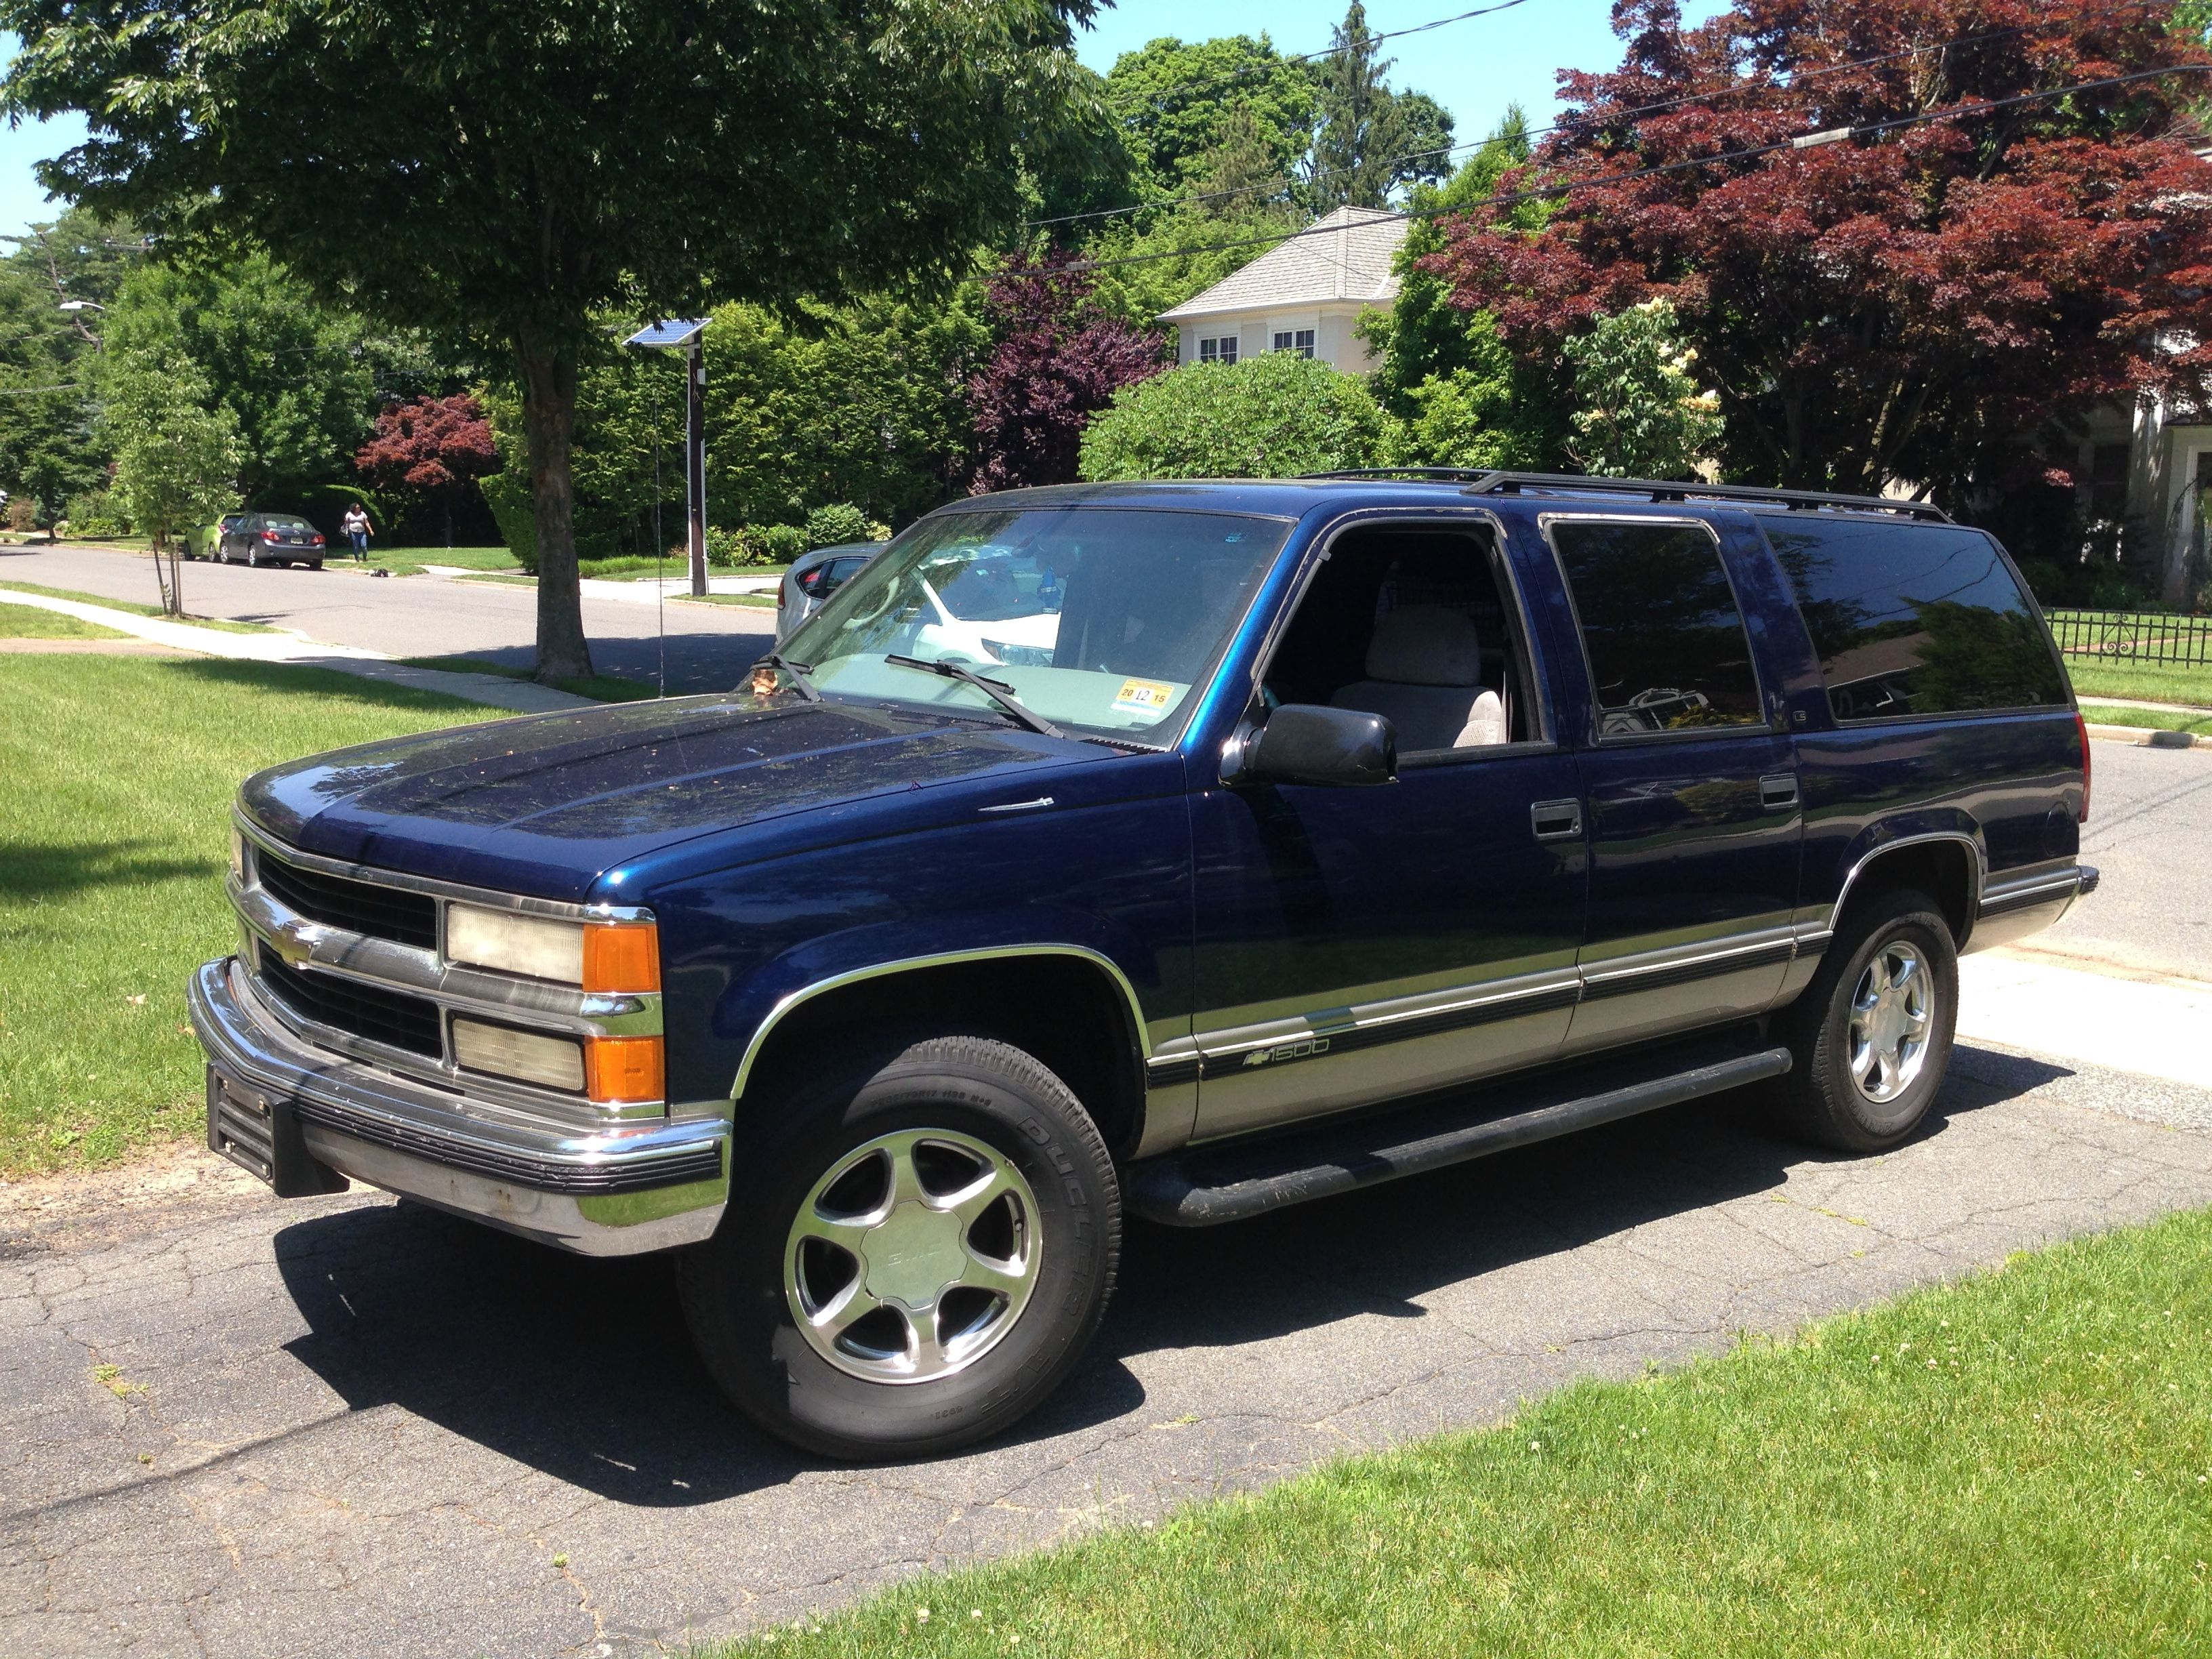 99 suburban 5 7l vortec v8 no rust clean interior only 115k miles still for sale  [ 3264 x 2448 Pixel ]